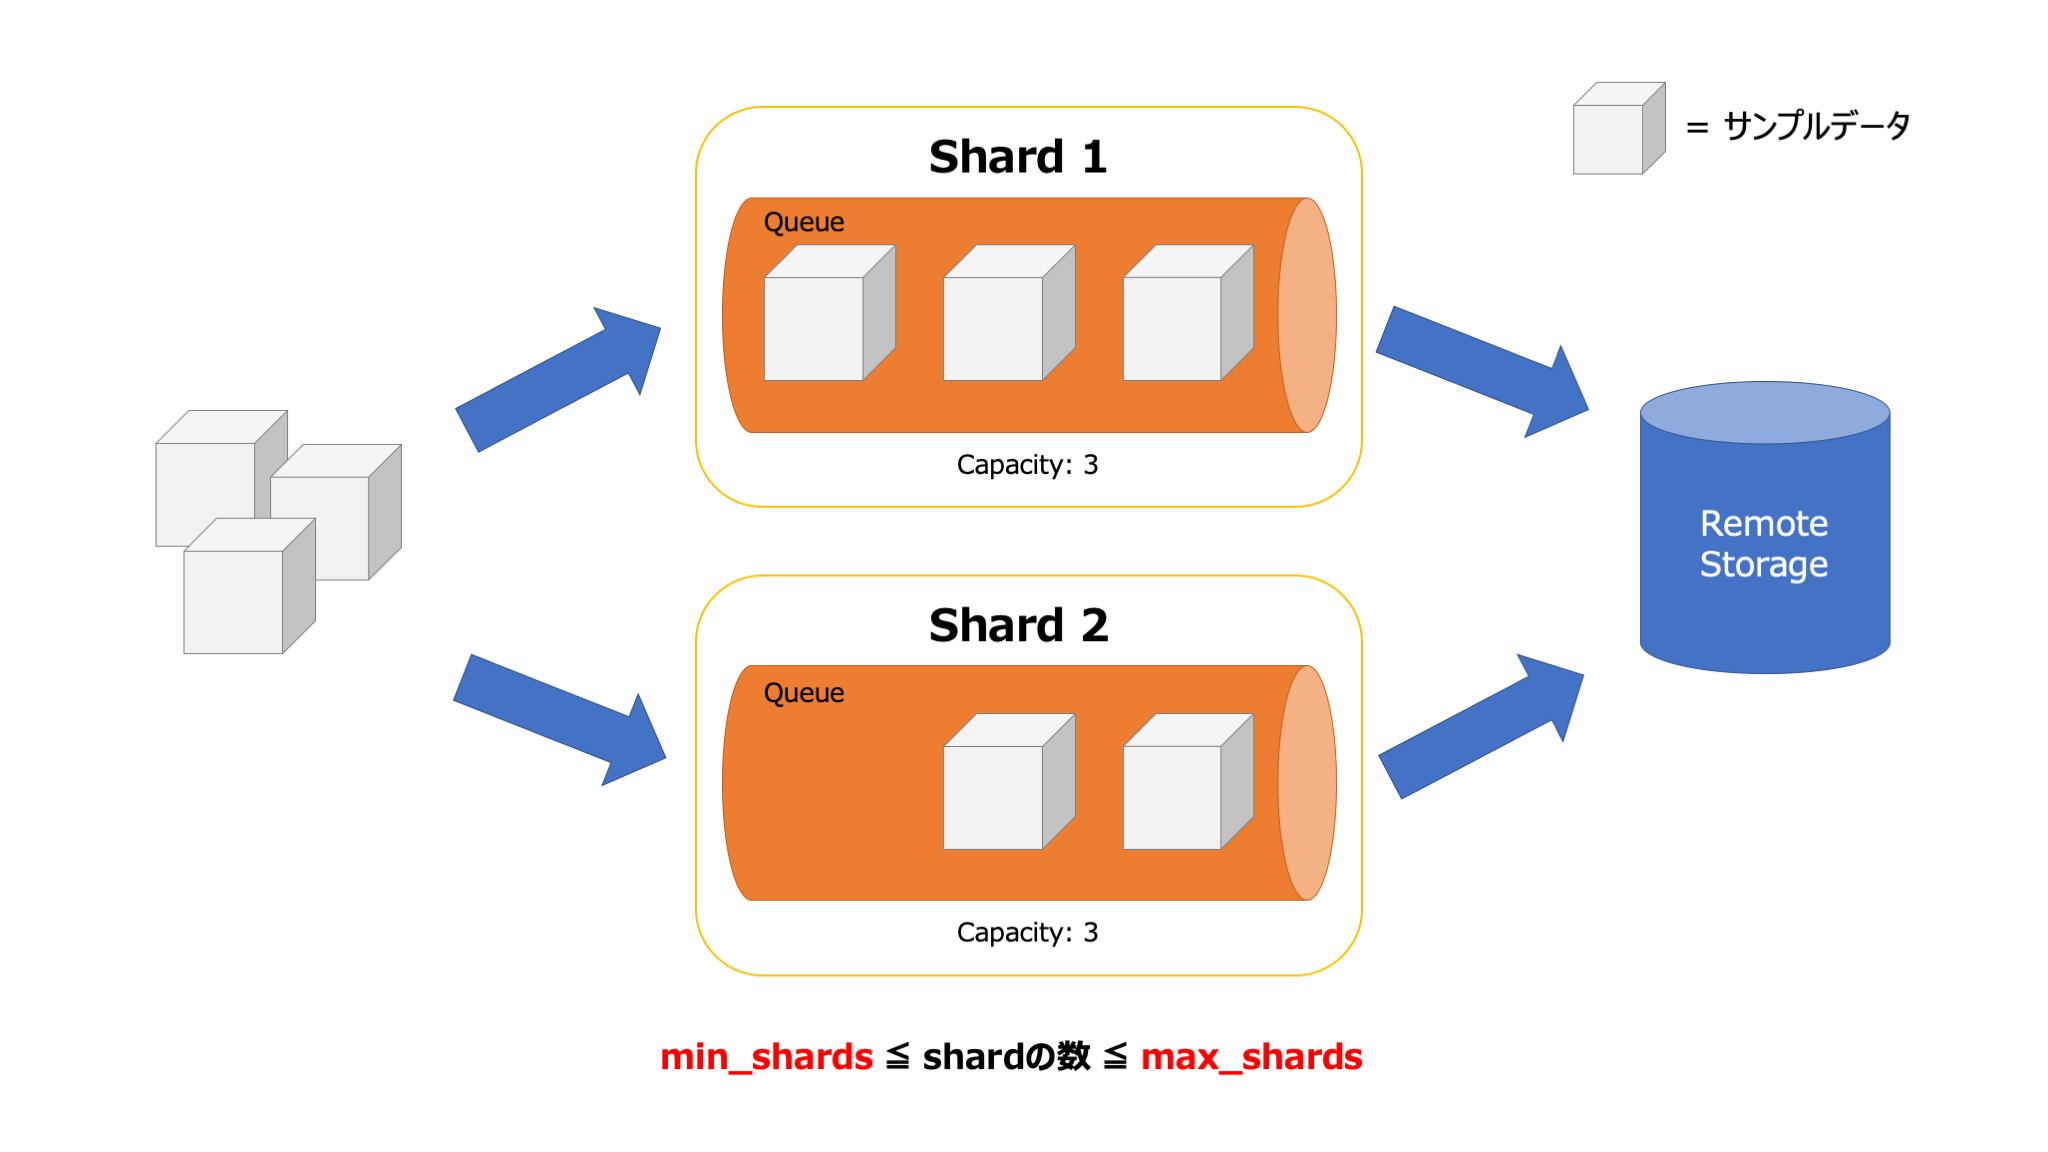 remote_storage_integrations_01.png